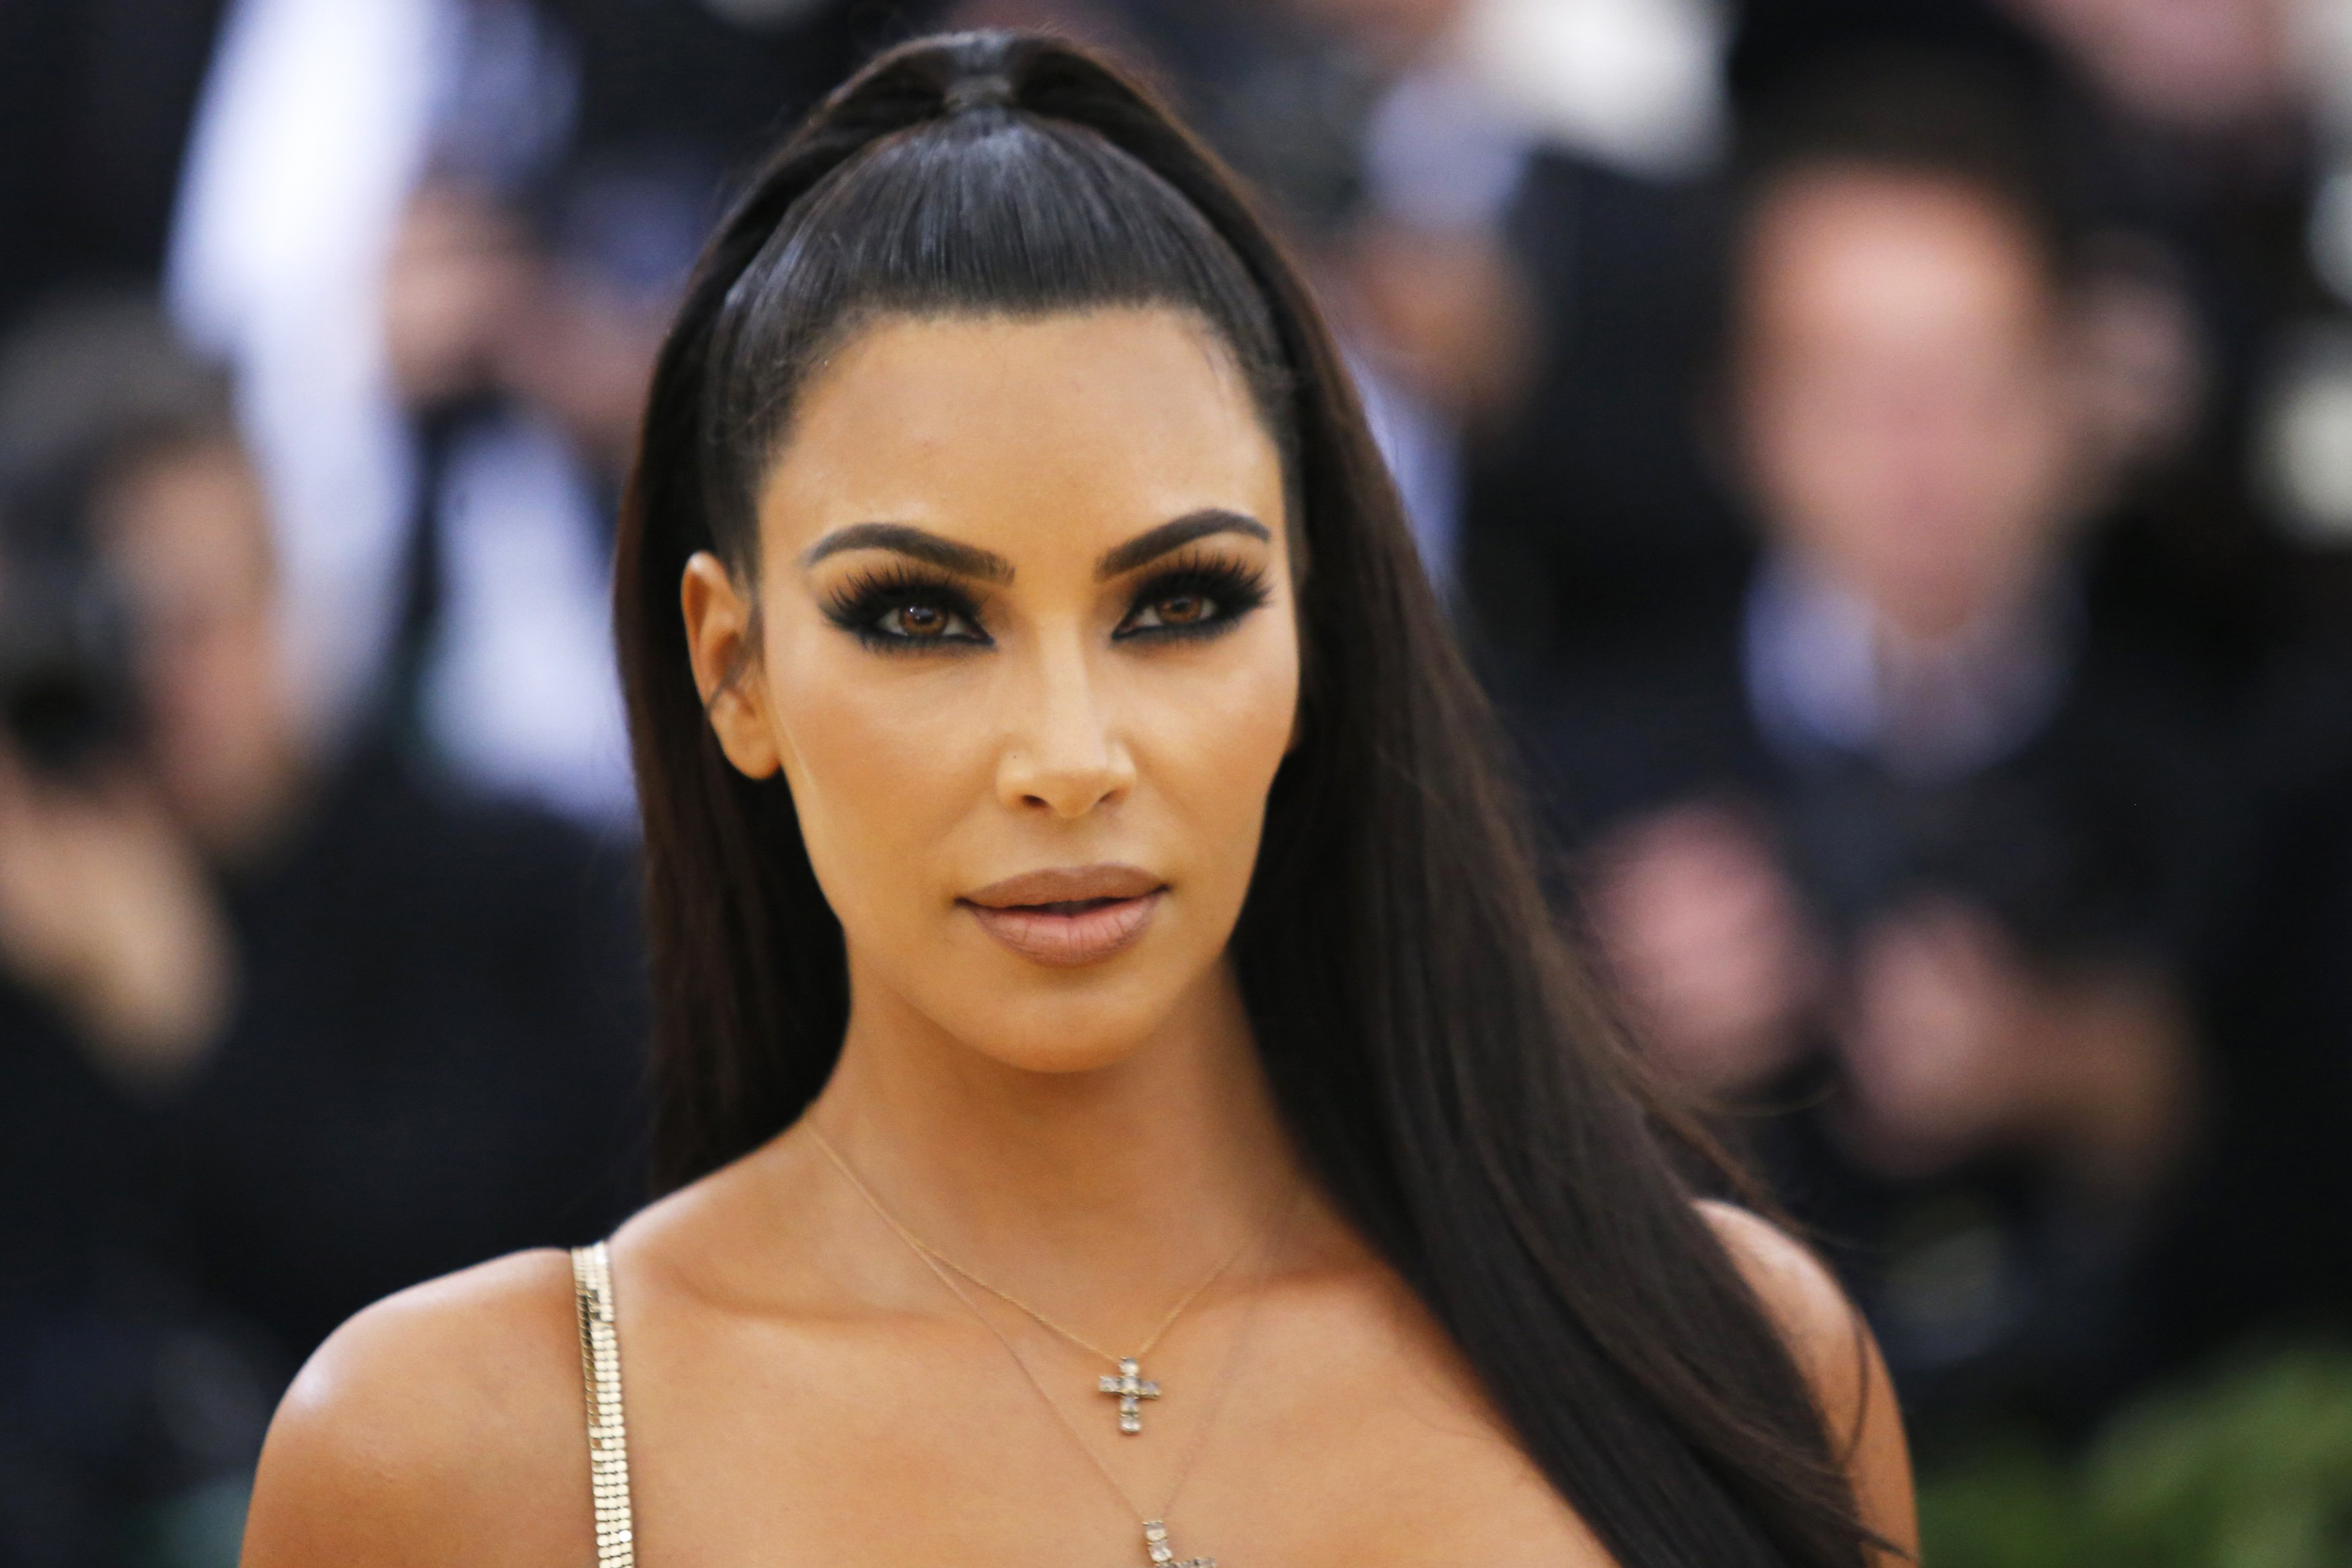 Kim Kardashian West to host 'SNL' in October